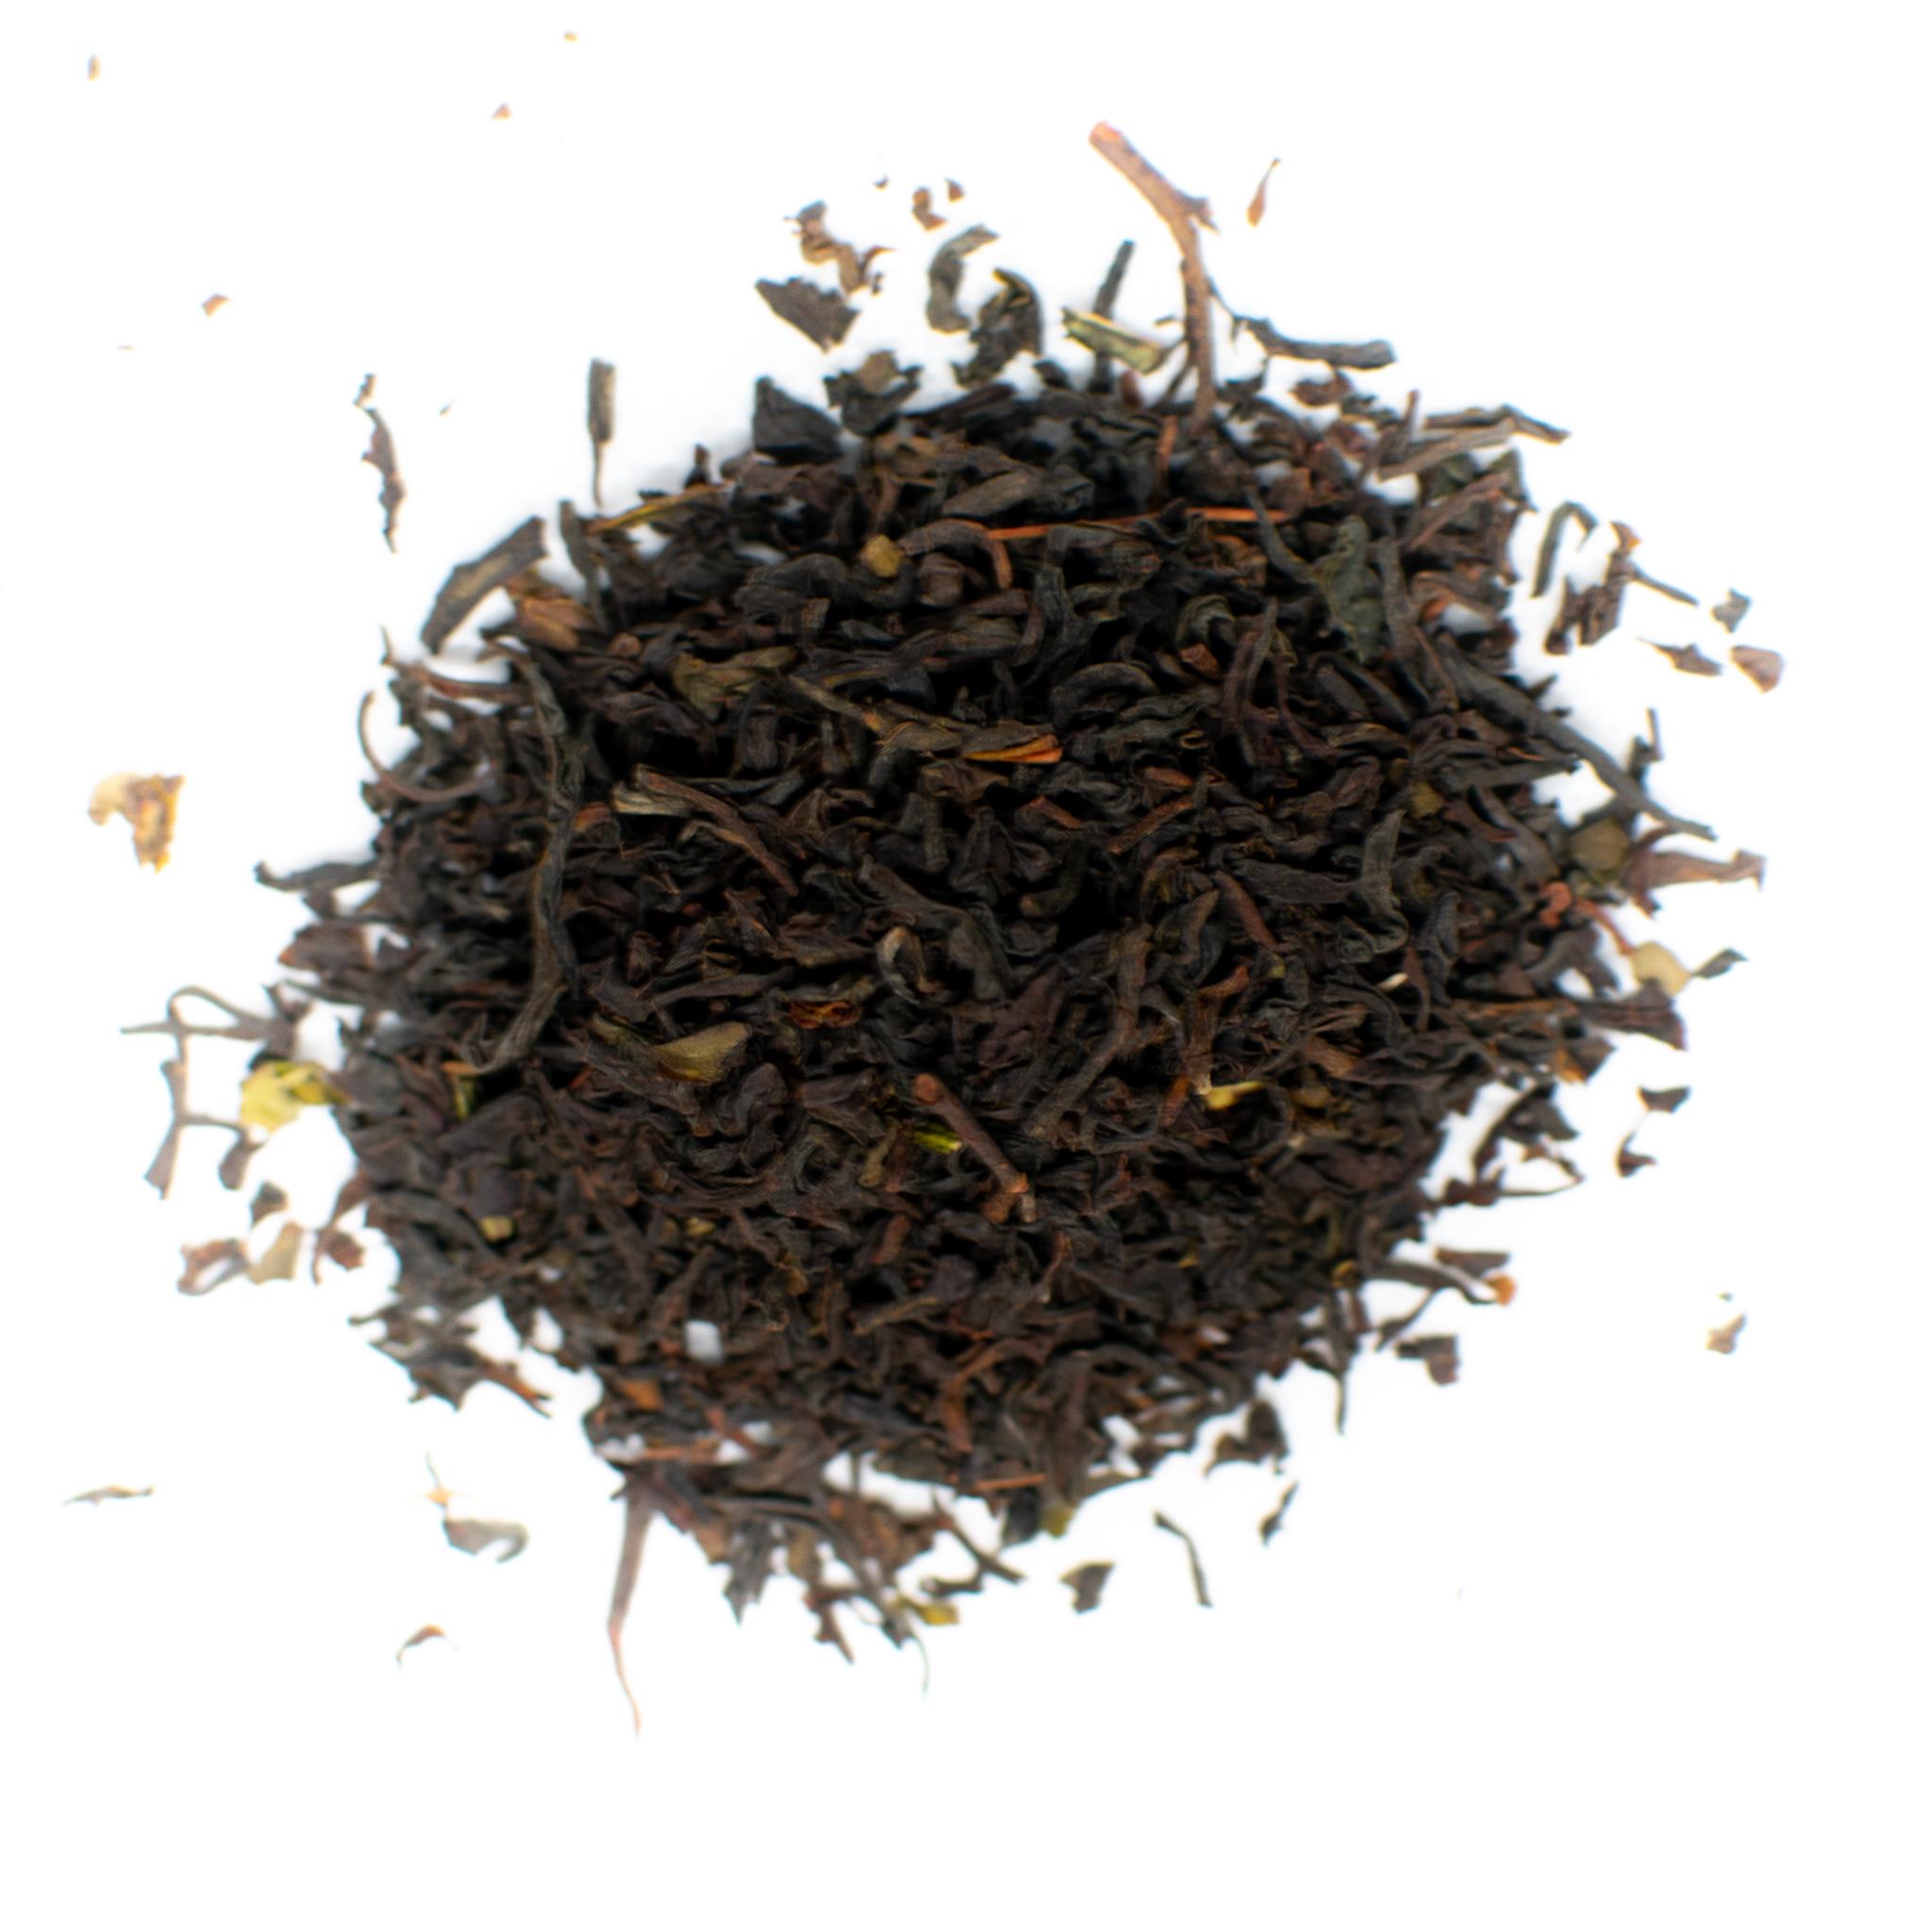 can herbal teas affect blood pressure